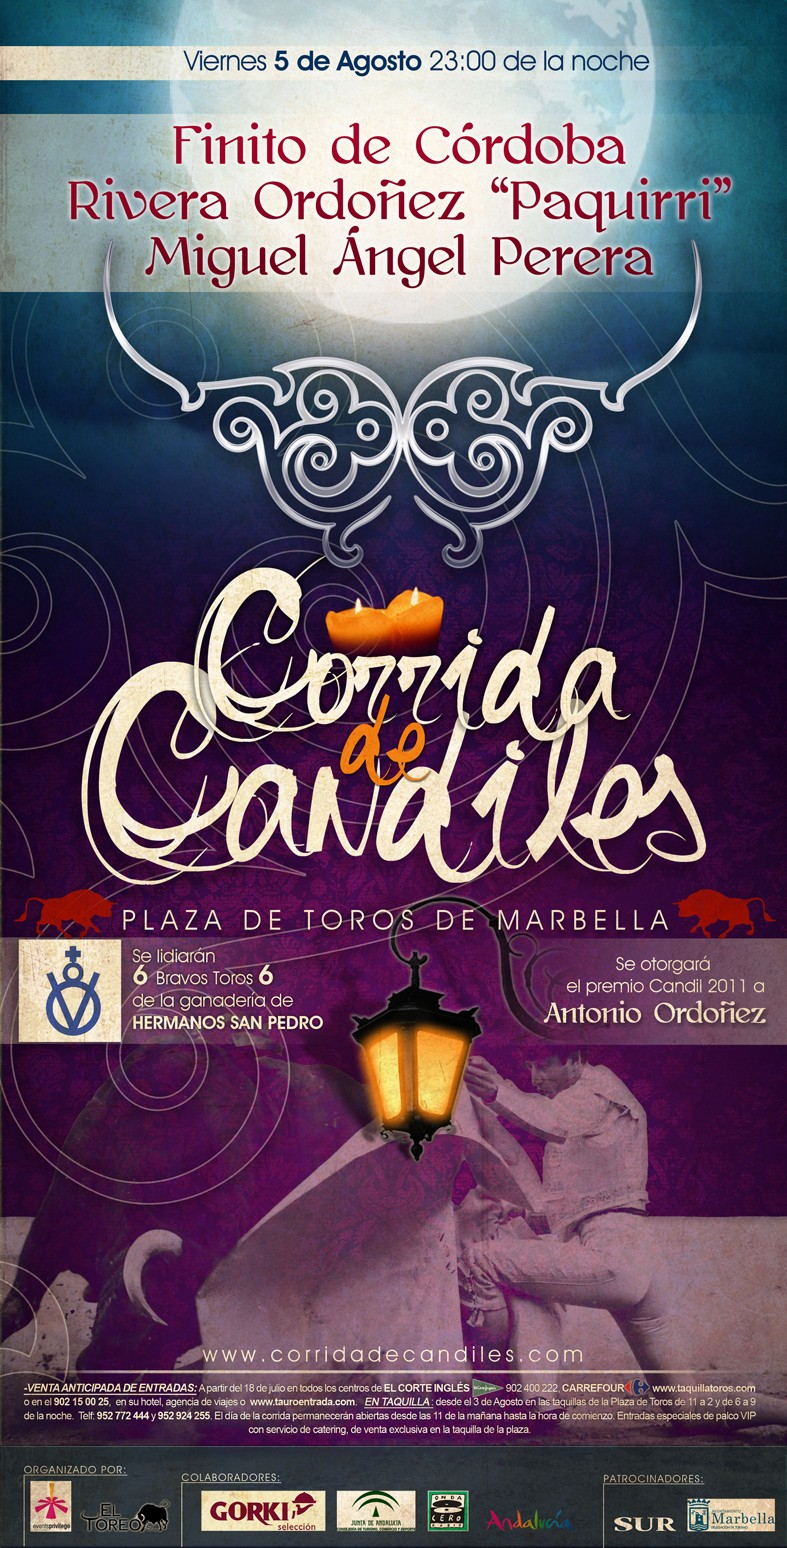 20110720164517-cartel-corrida-de-candiles-de-marbella.jpg